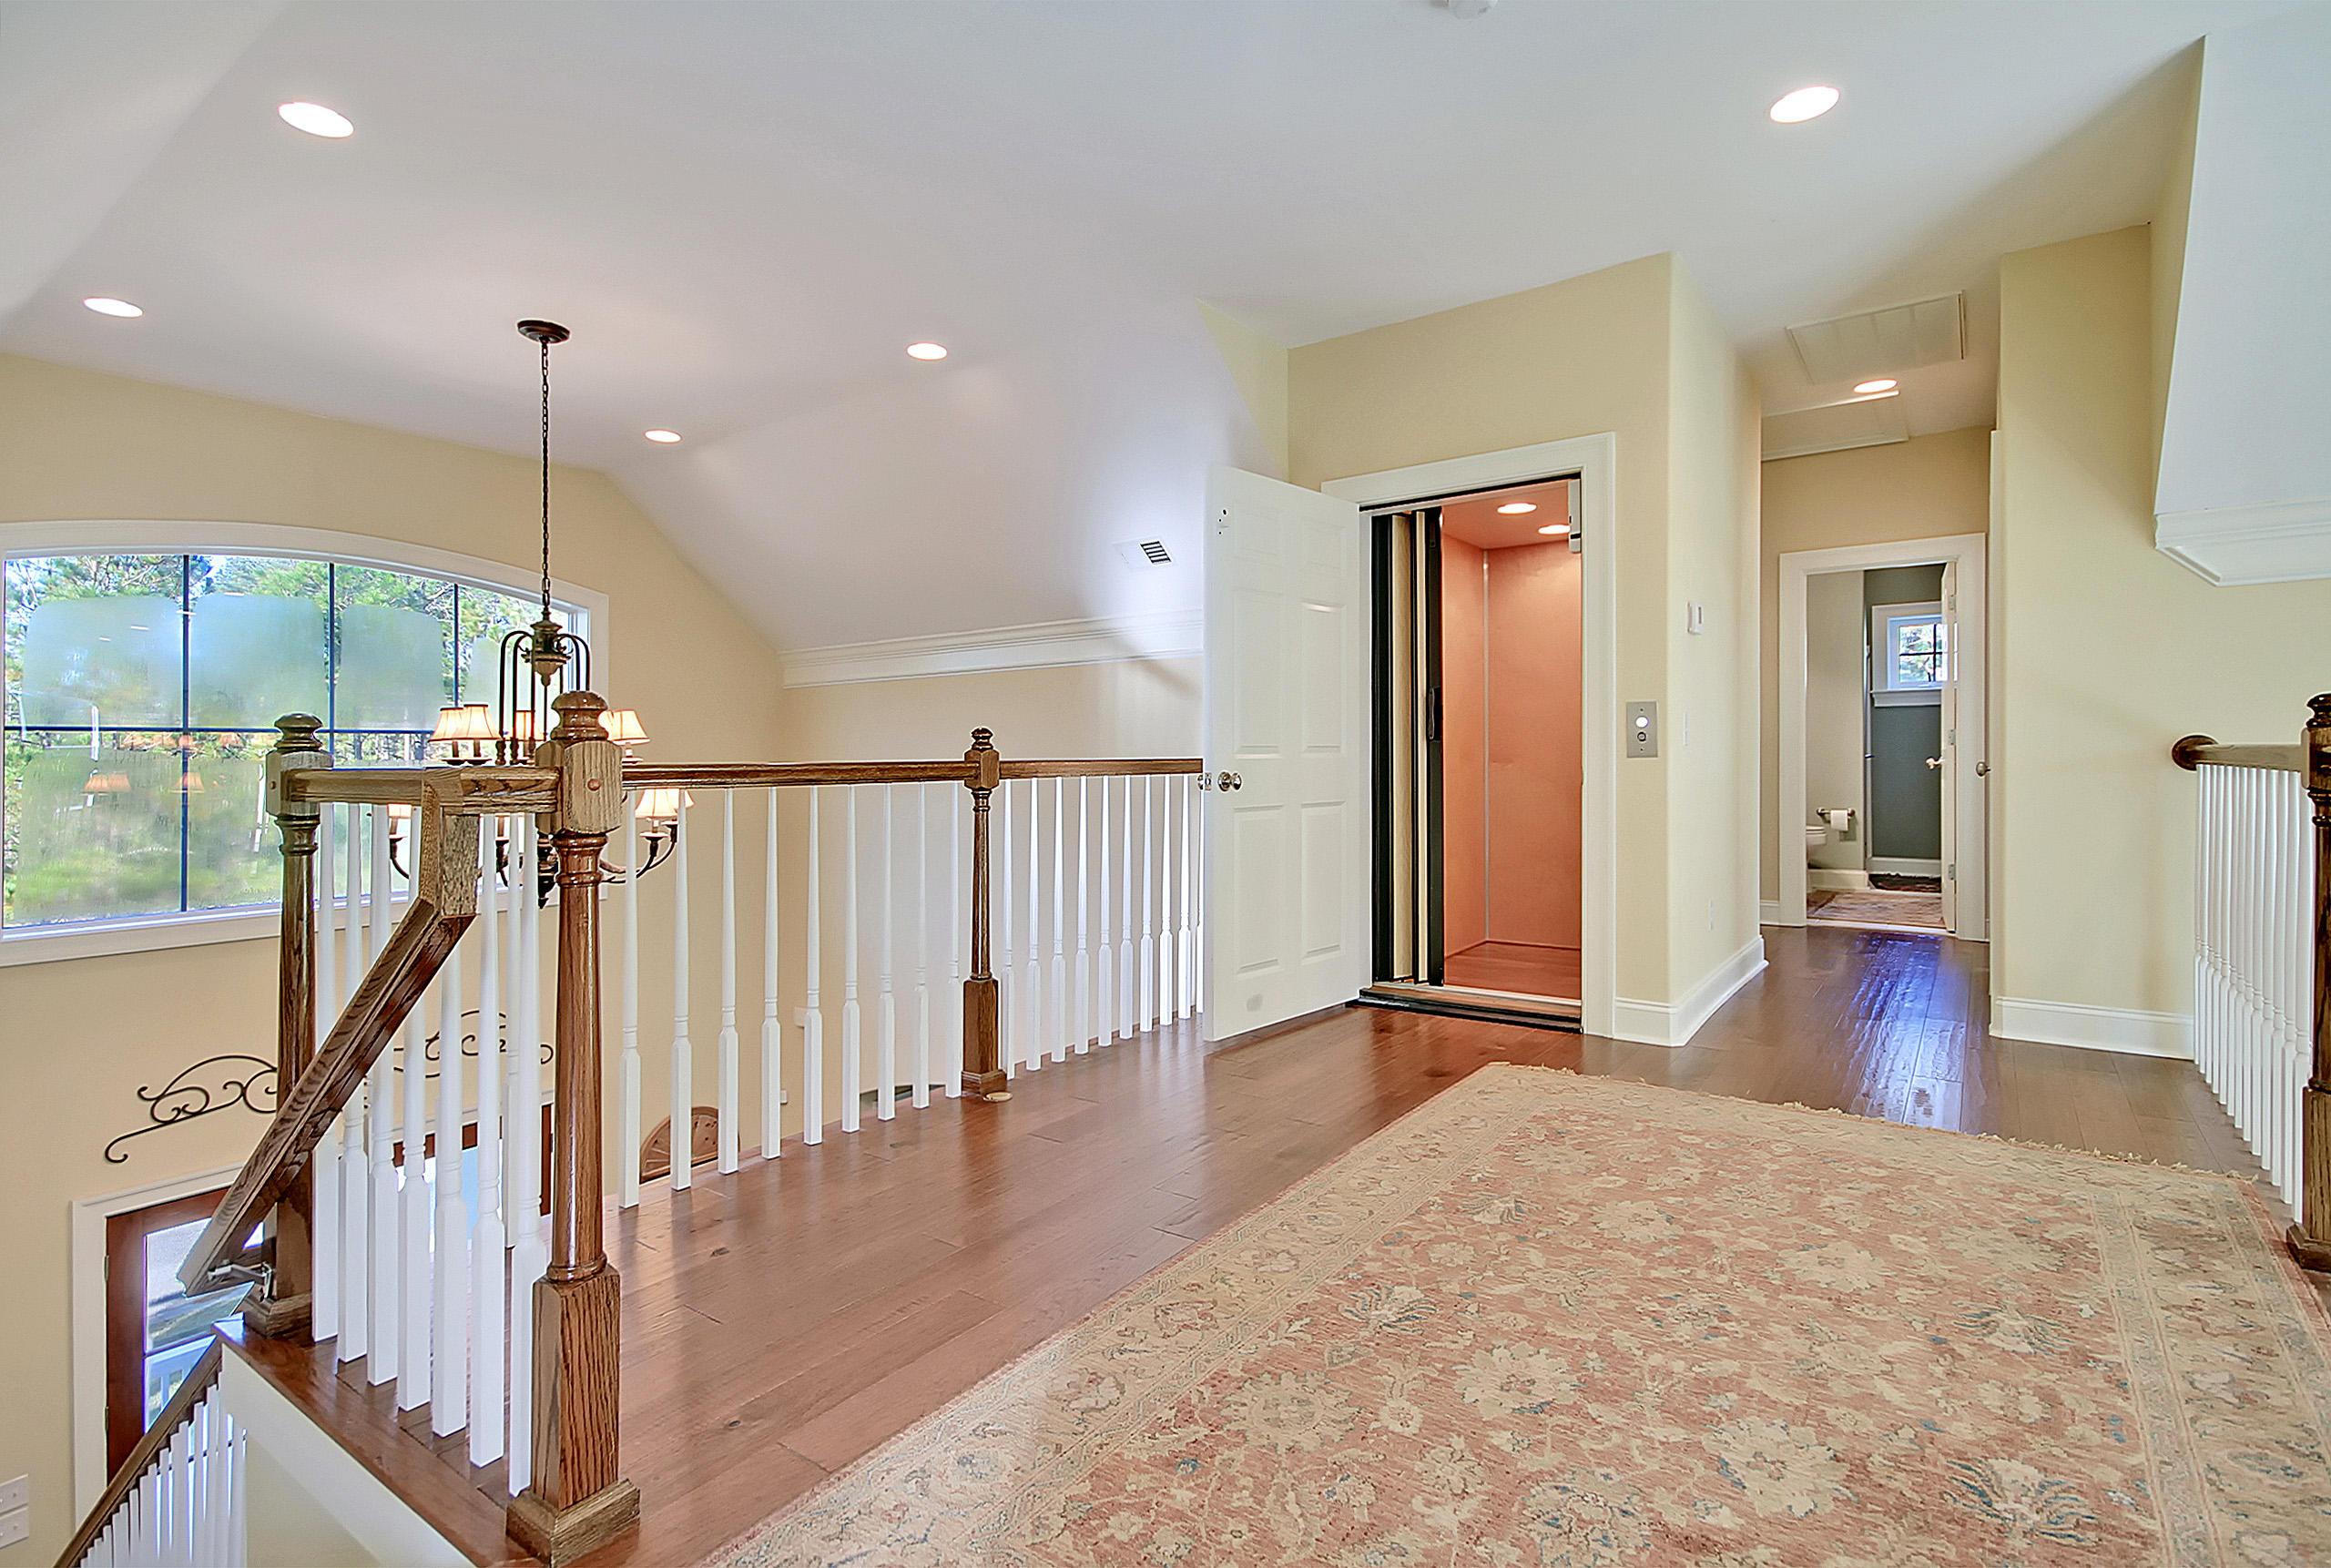 Rivertowne Country Club Homes For Sale - 2601 Kiln Creek, Mount Pleasant, SC - 60